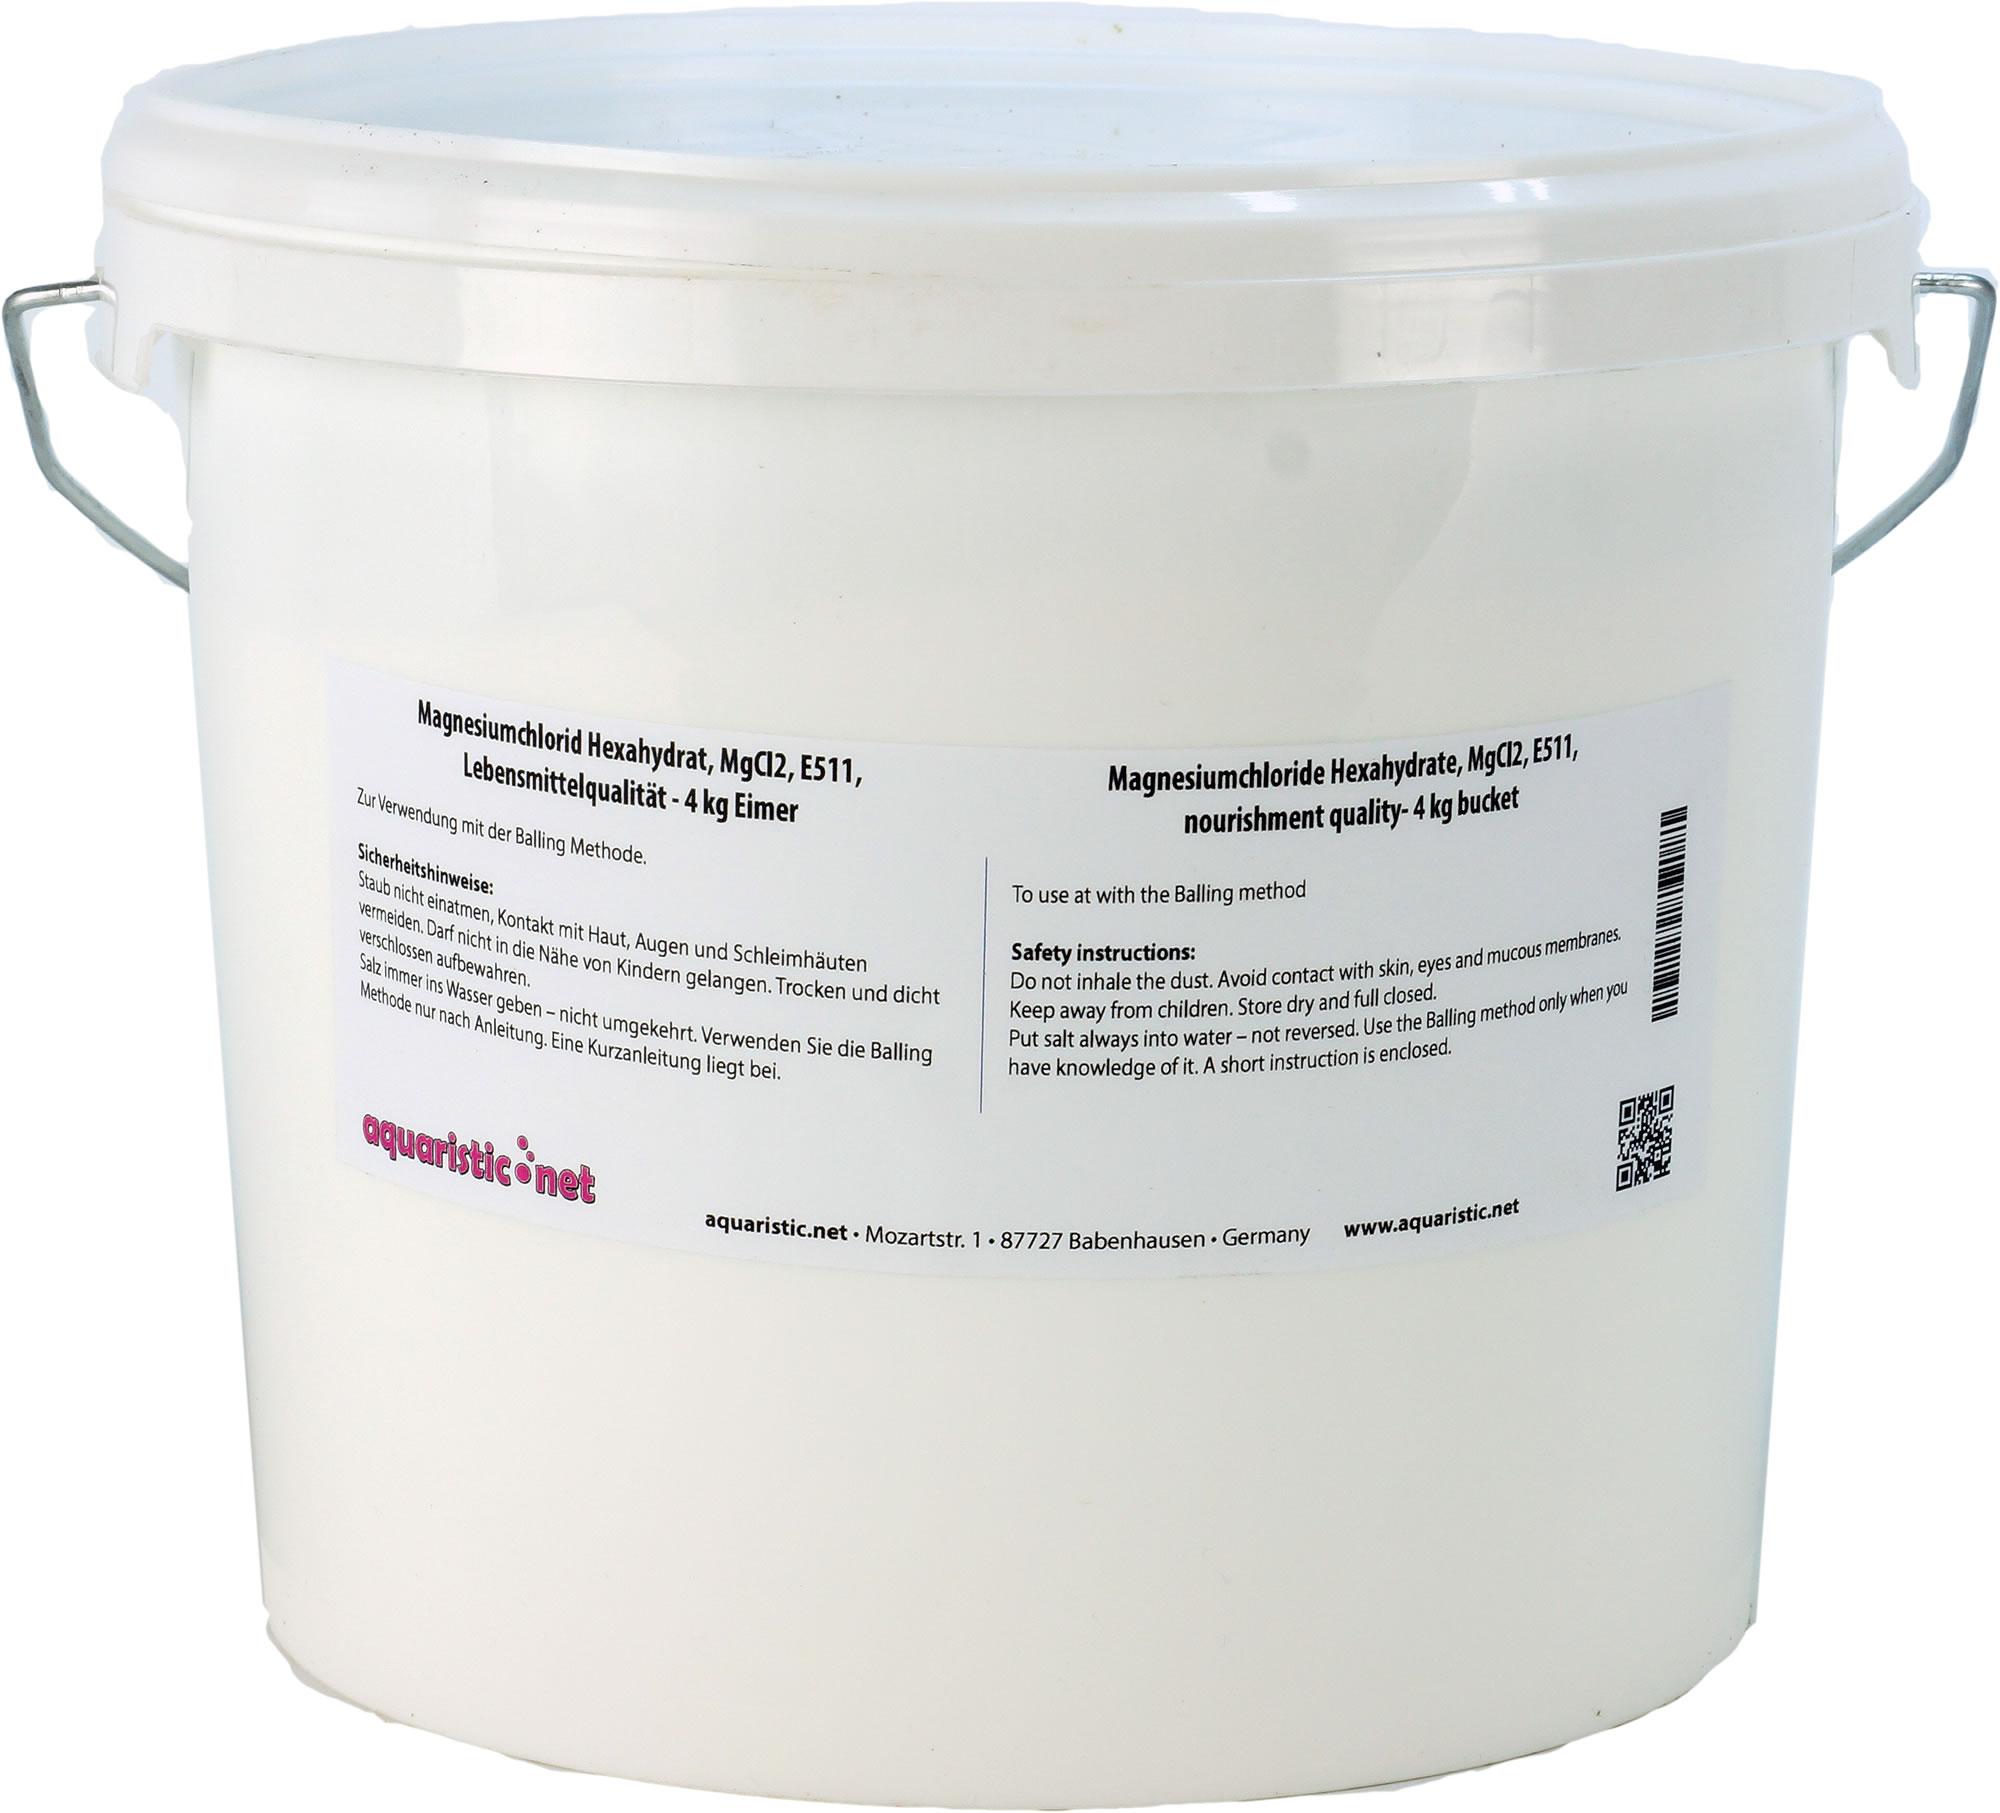 Magnesiumchlorid Hexahydrat, MgCl2, E511, Lebensmittelqualit�t